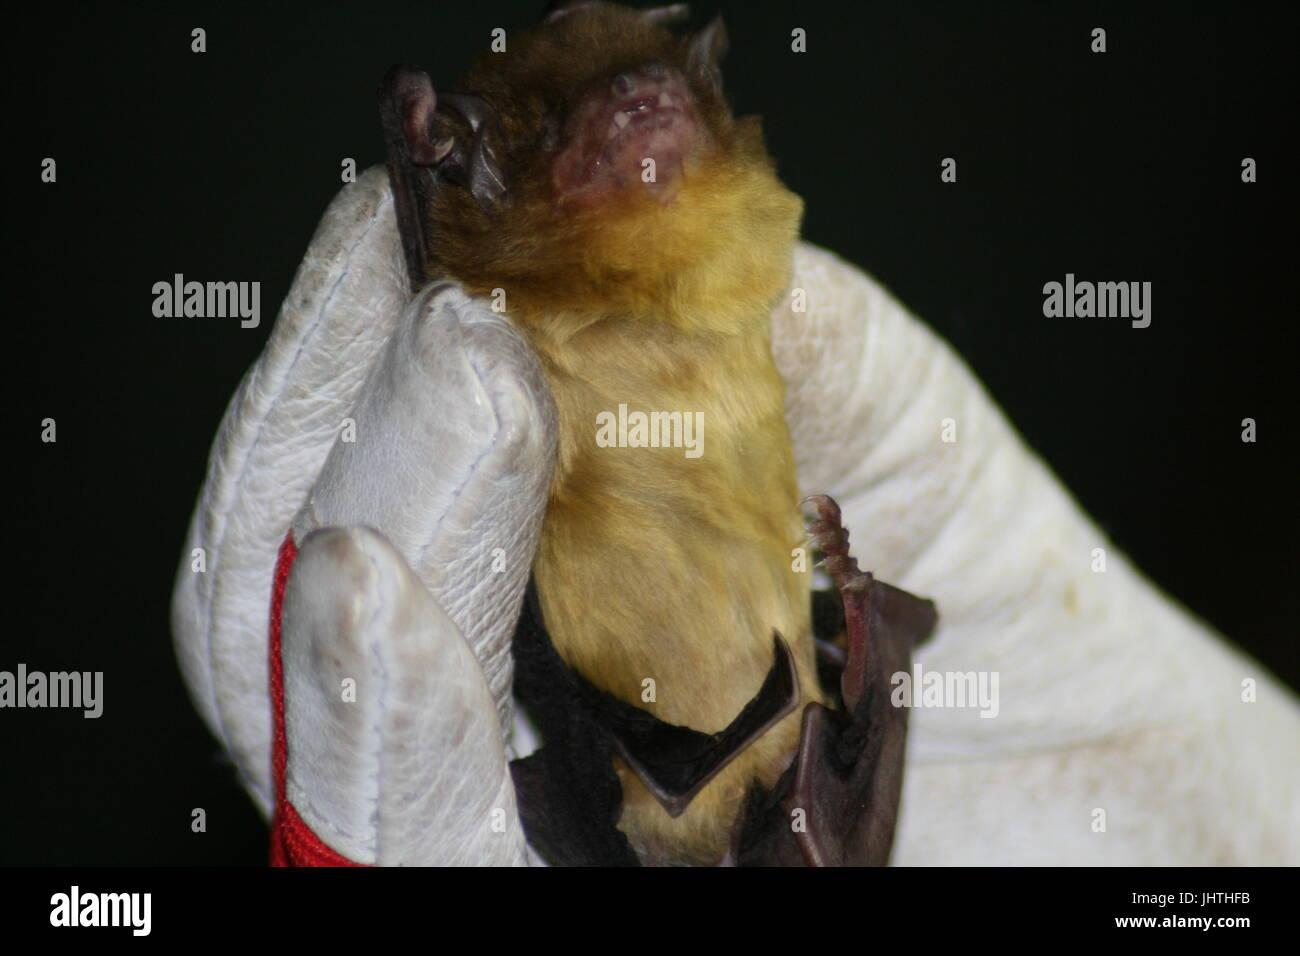 greenish yellow bat, african bat, Scotophilus viridis, s. viridis - Stock Image